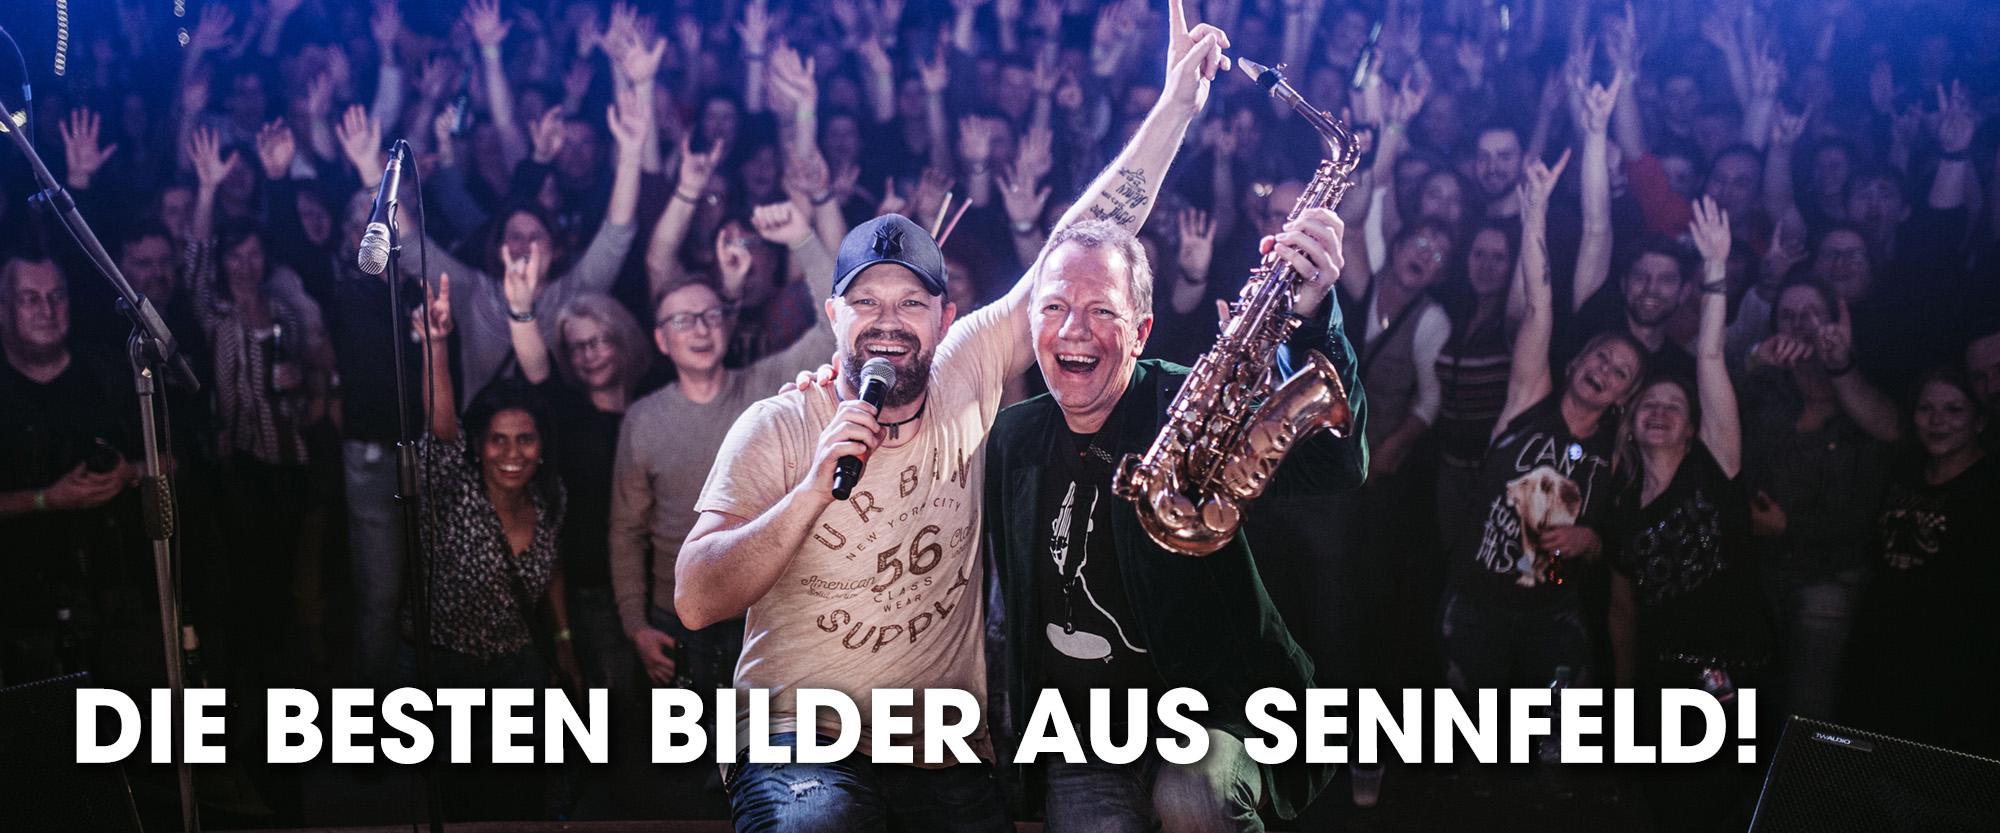 Rockschuppen-LIVE-BesteBilder-Sennfeld.jpg